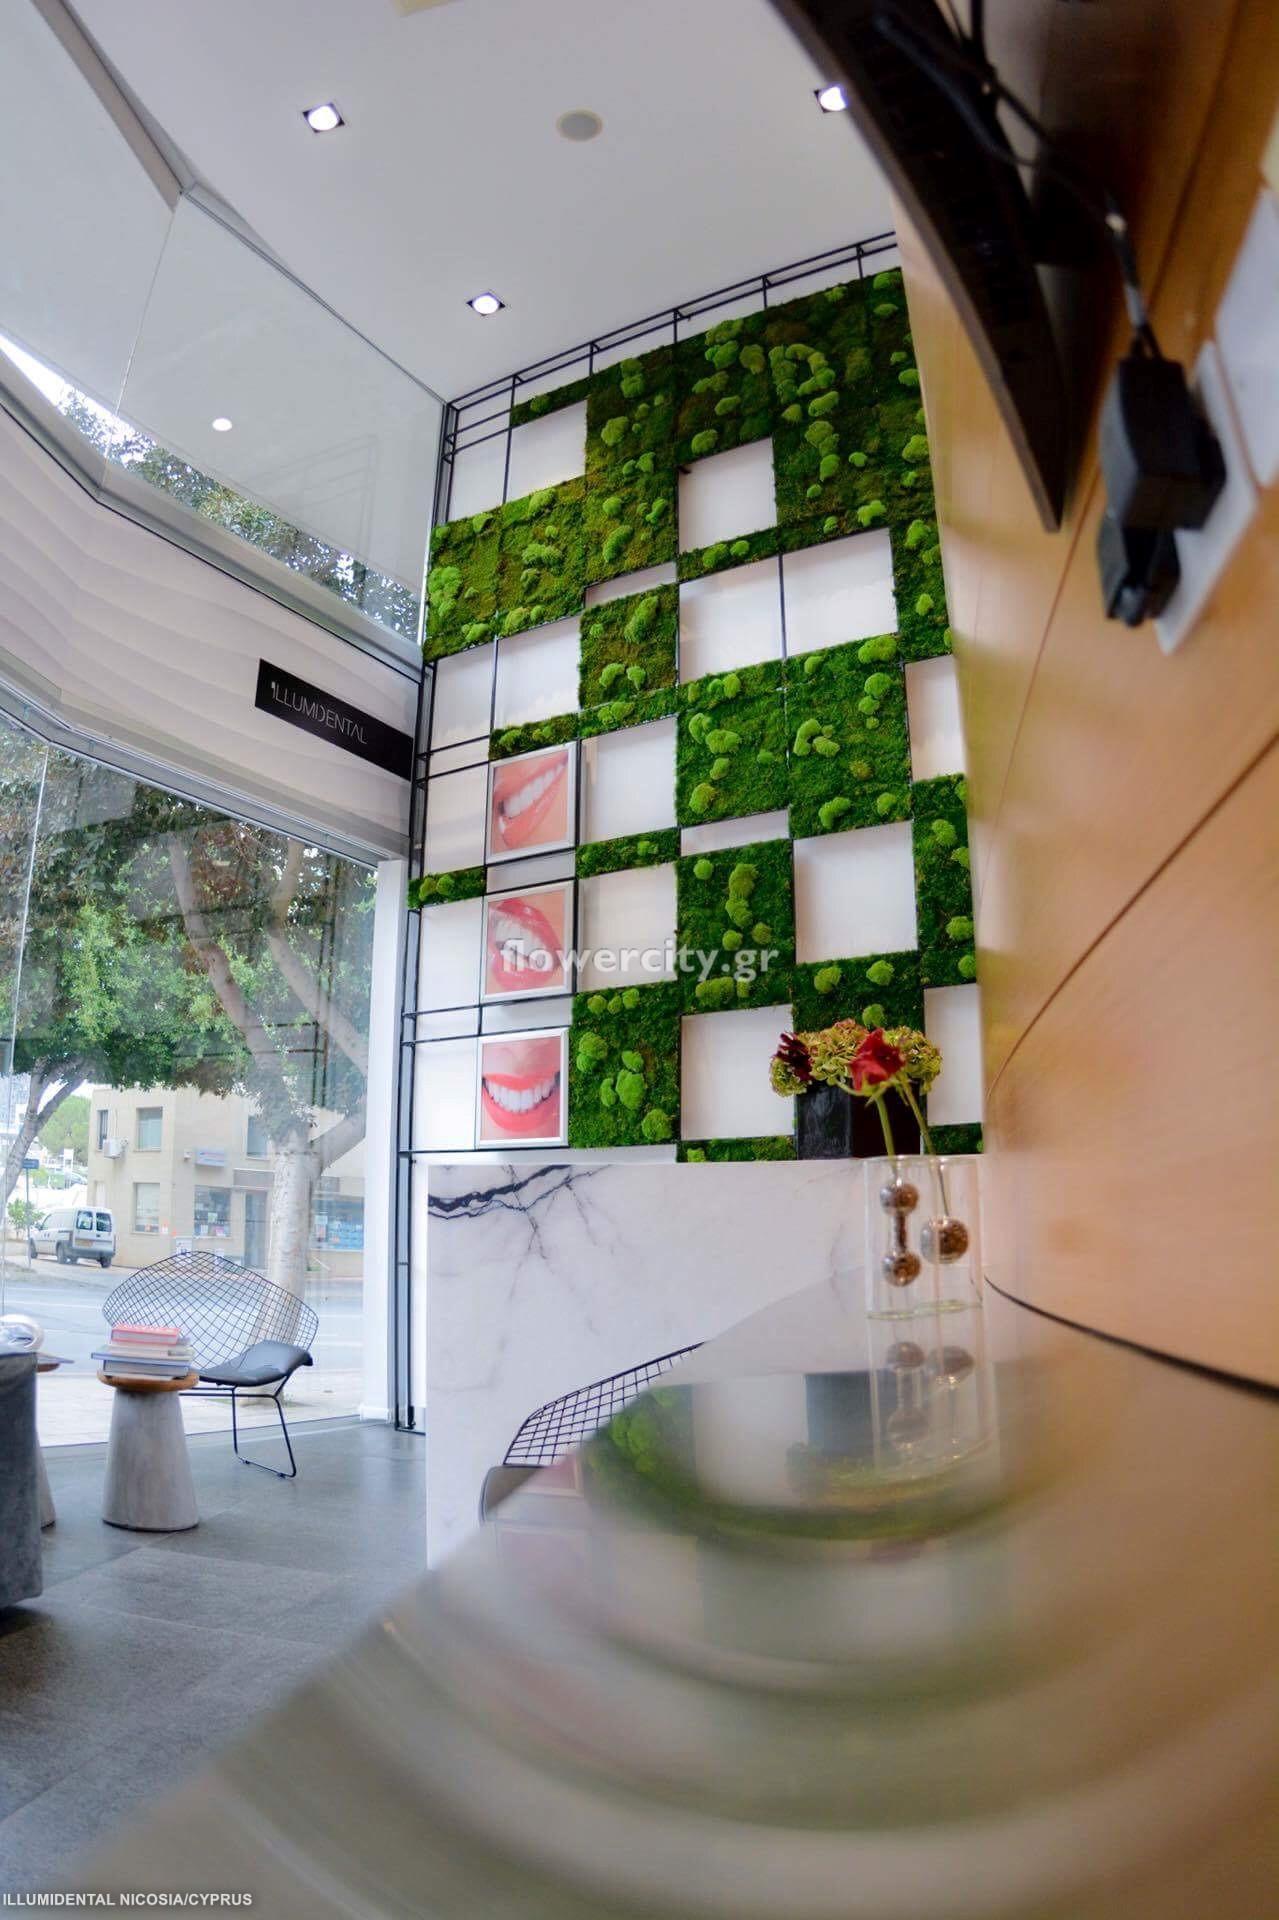 ILLUMIDENTAL διατηρημένα φυτά